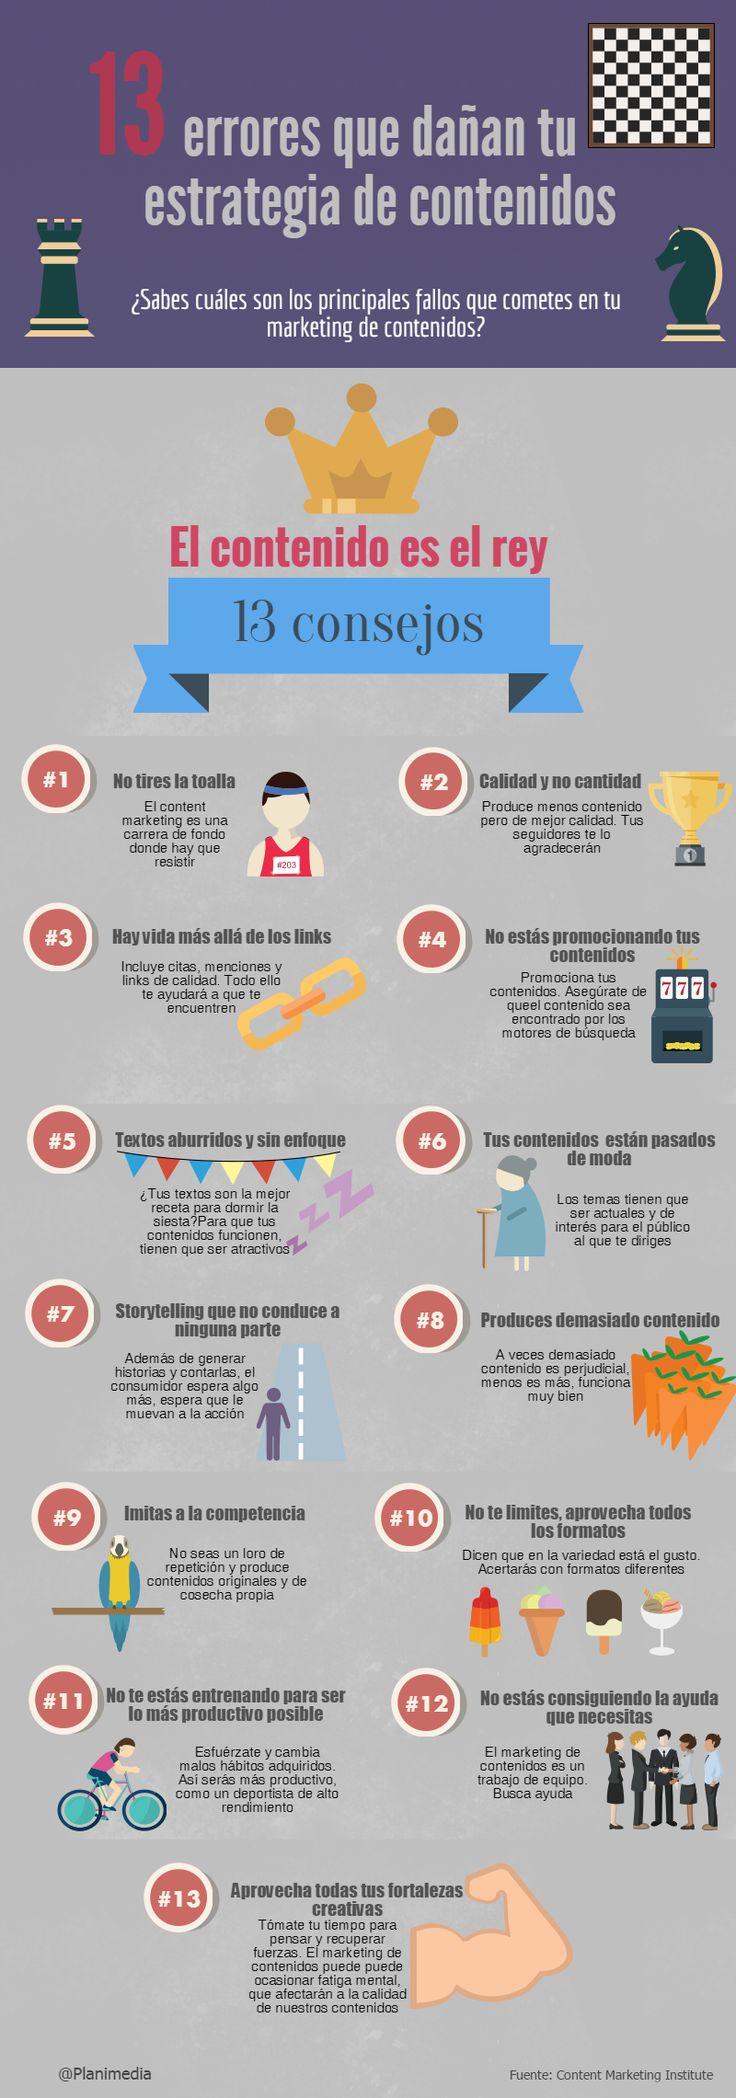 13 errores que dañan tu estrategia de contenidos. Infografía en español. #CommunityManager